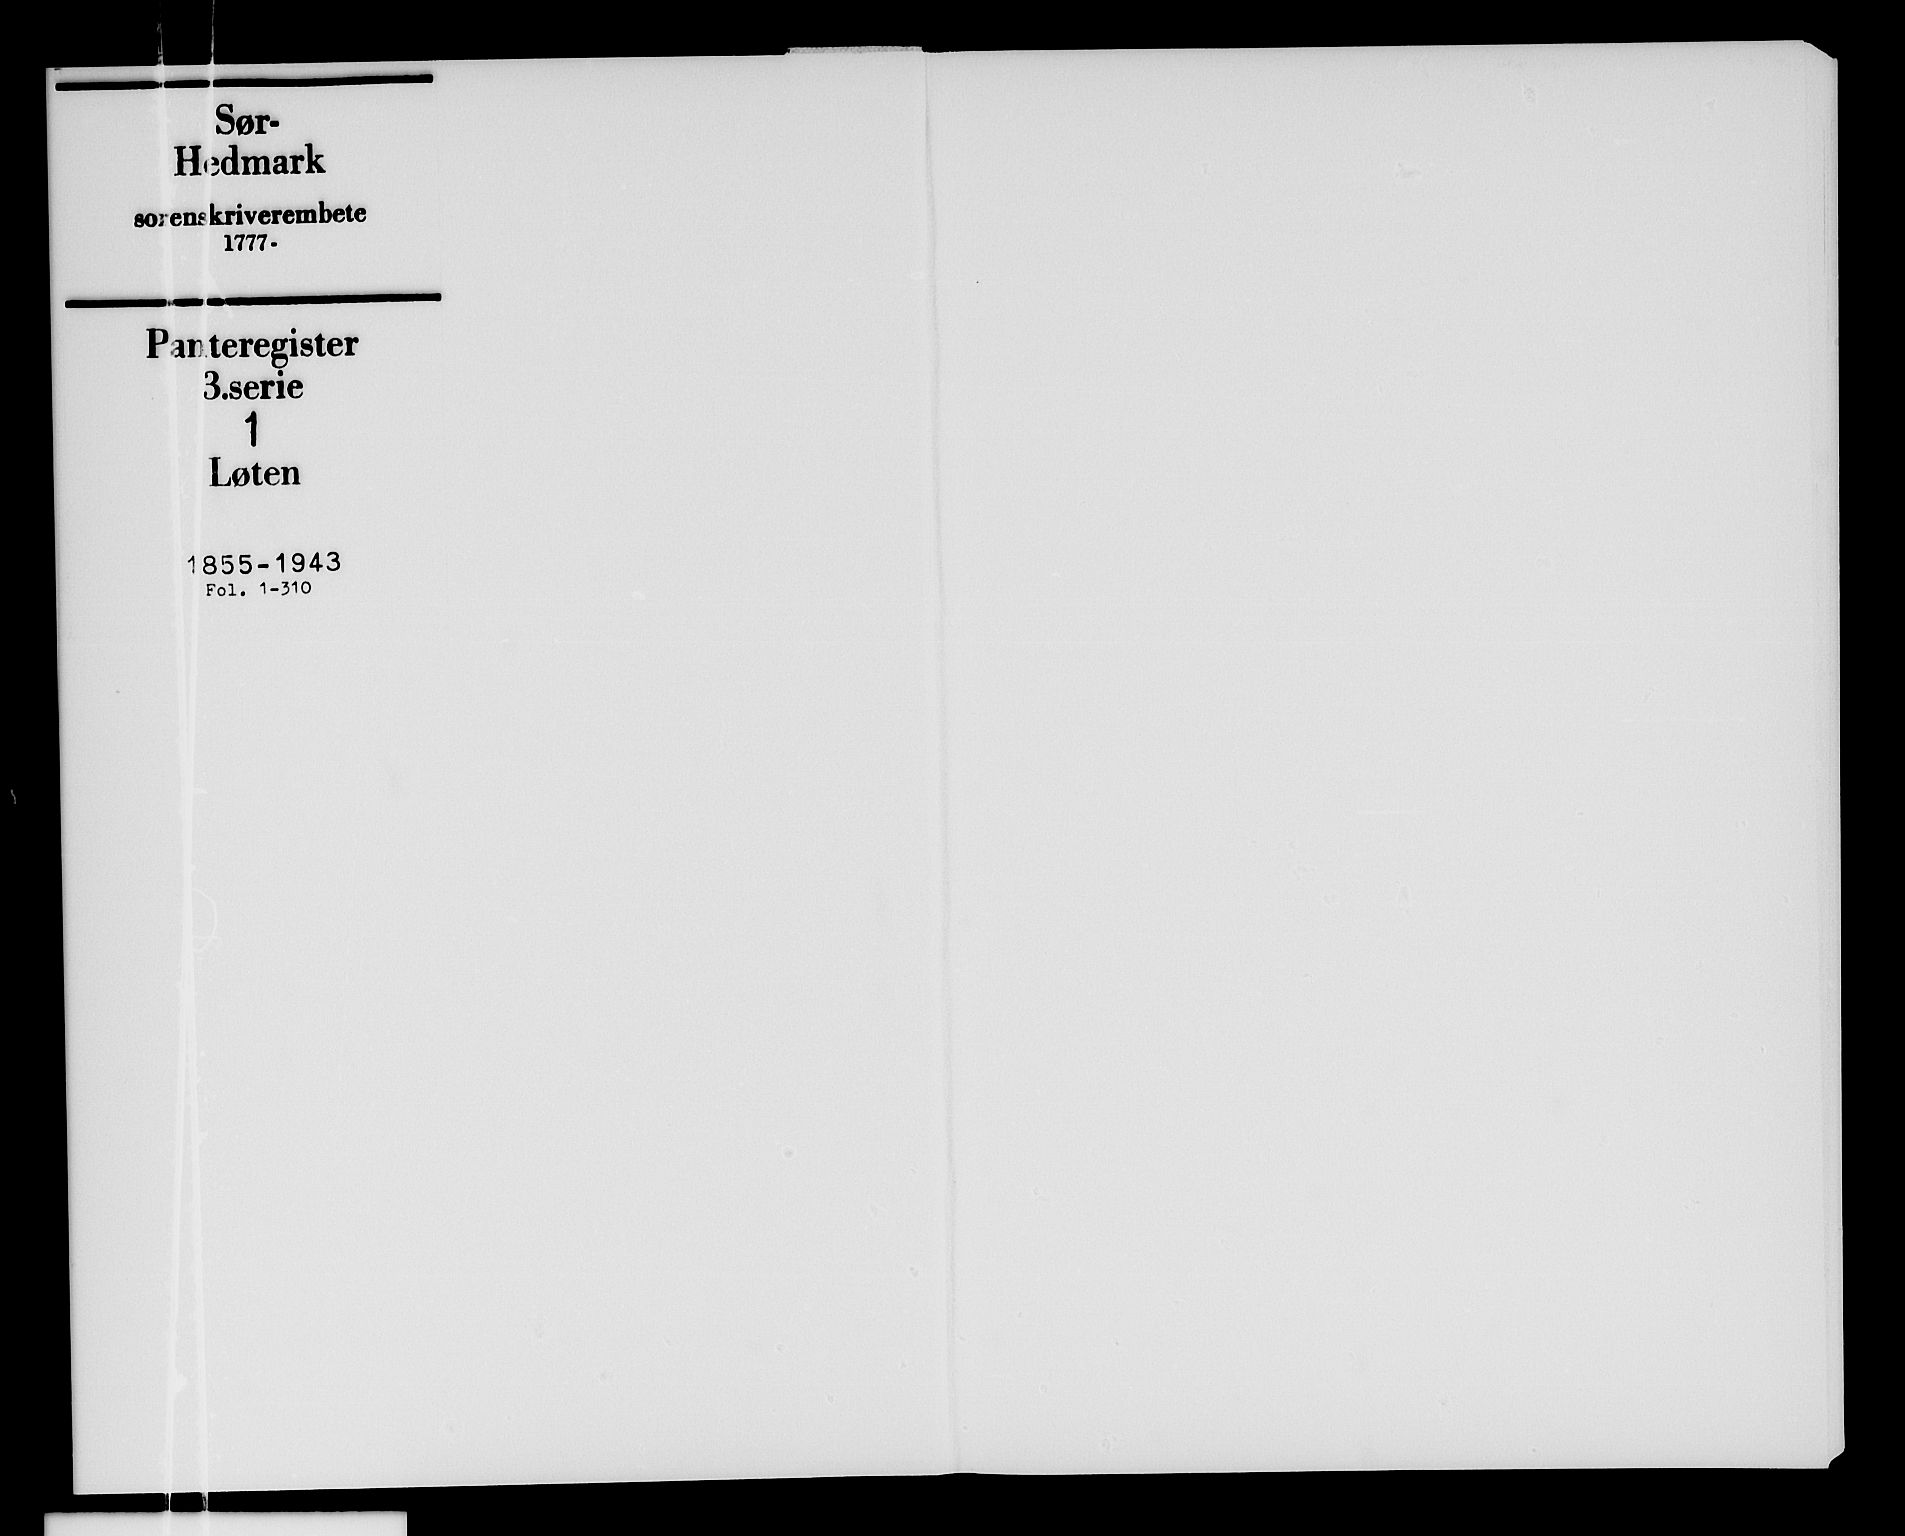 SAH, Sør-Hedmark sorenskriveri, H/Ha/Hac/Hacc/L0001: Panteregister nr. 3.1, 1855-1943